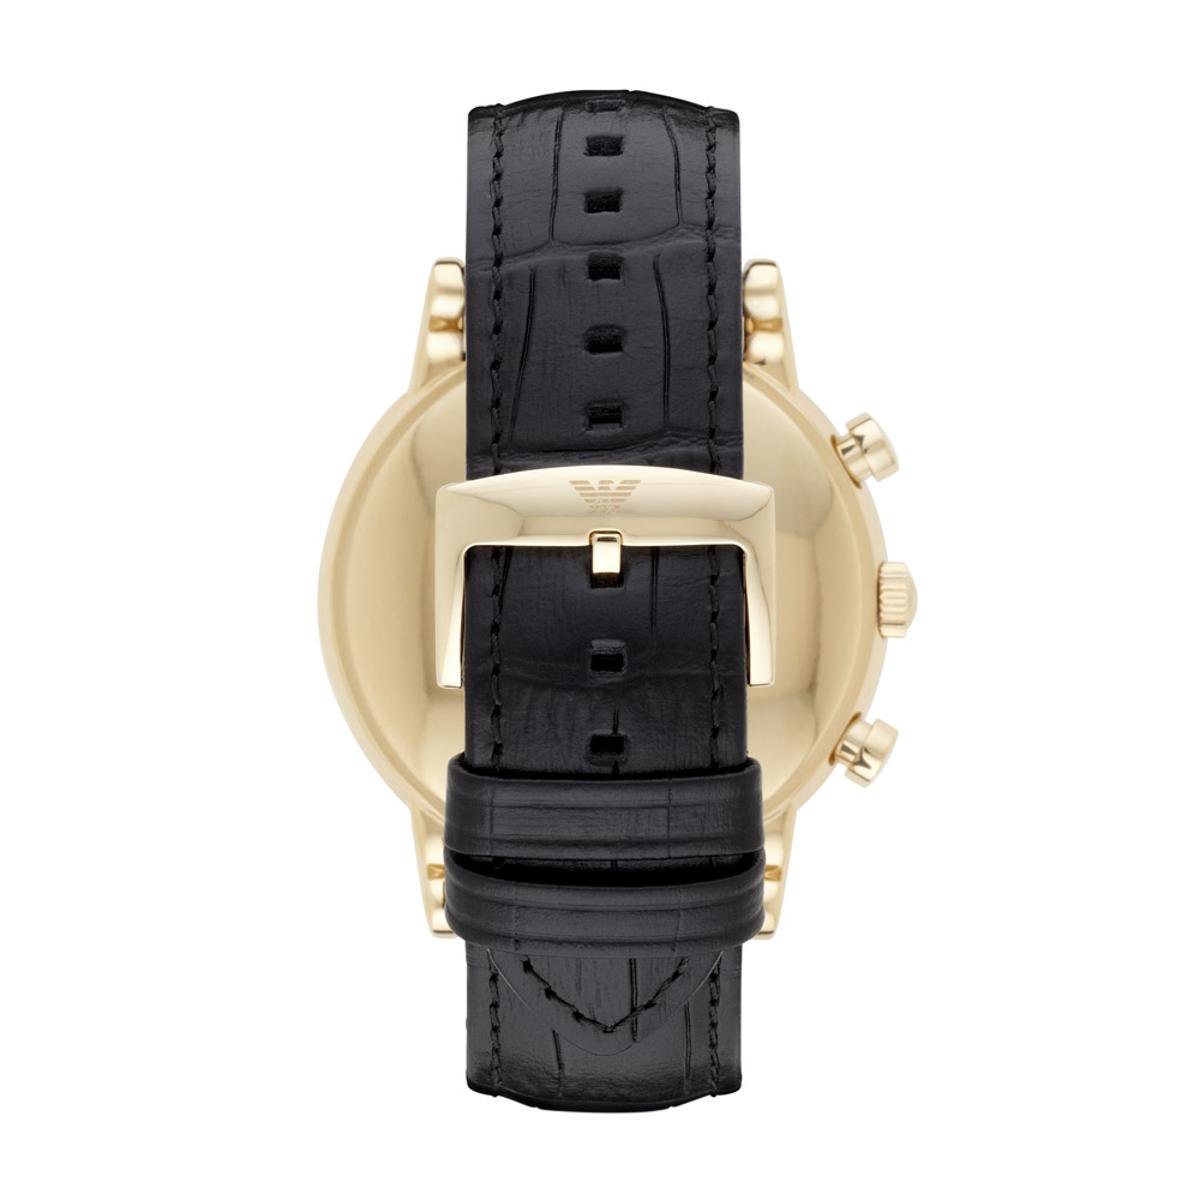 73662963cc3 Relógio emporio armani masculino dourado compre agora zattini jpg 1200x1200 Relogio  emporio armani dourado